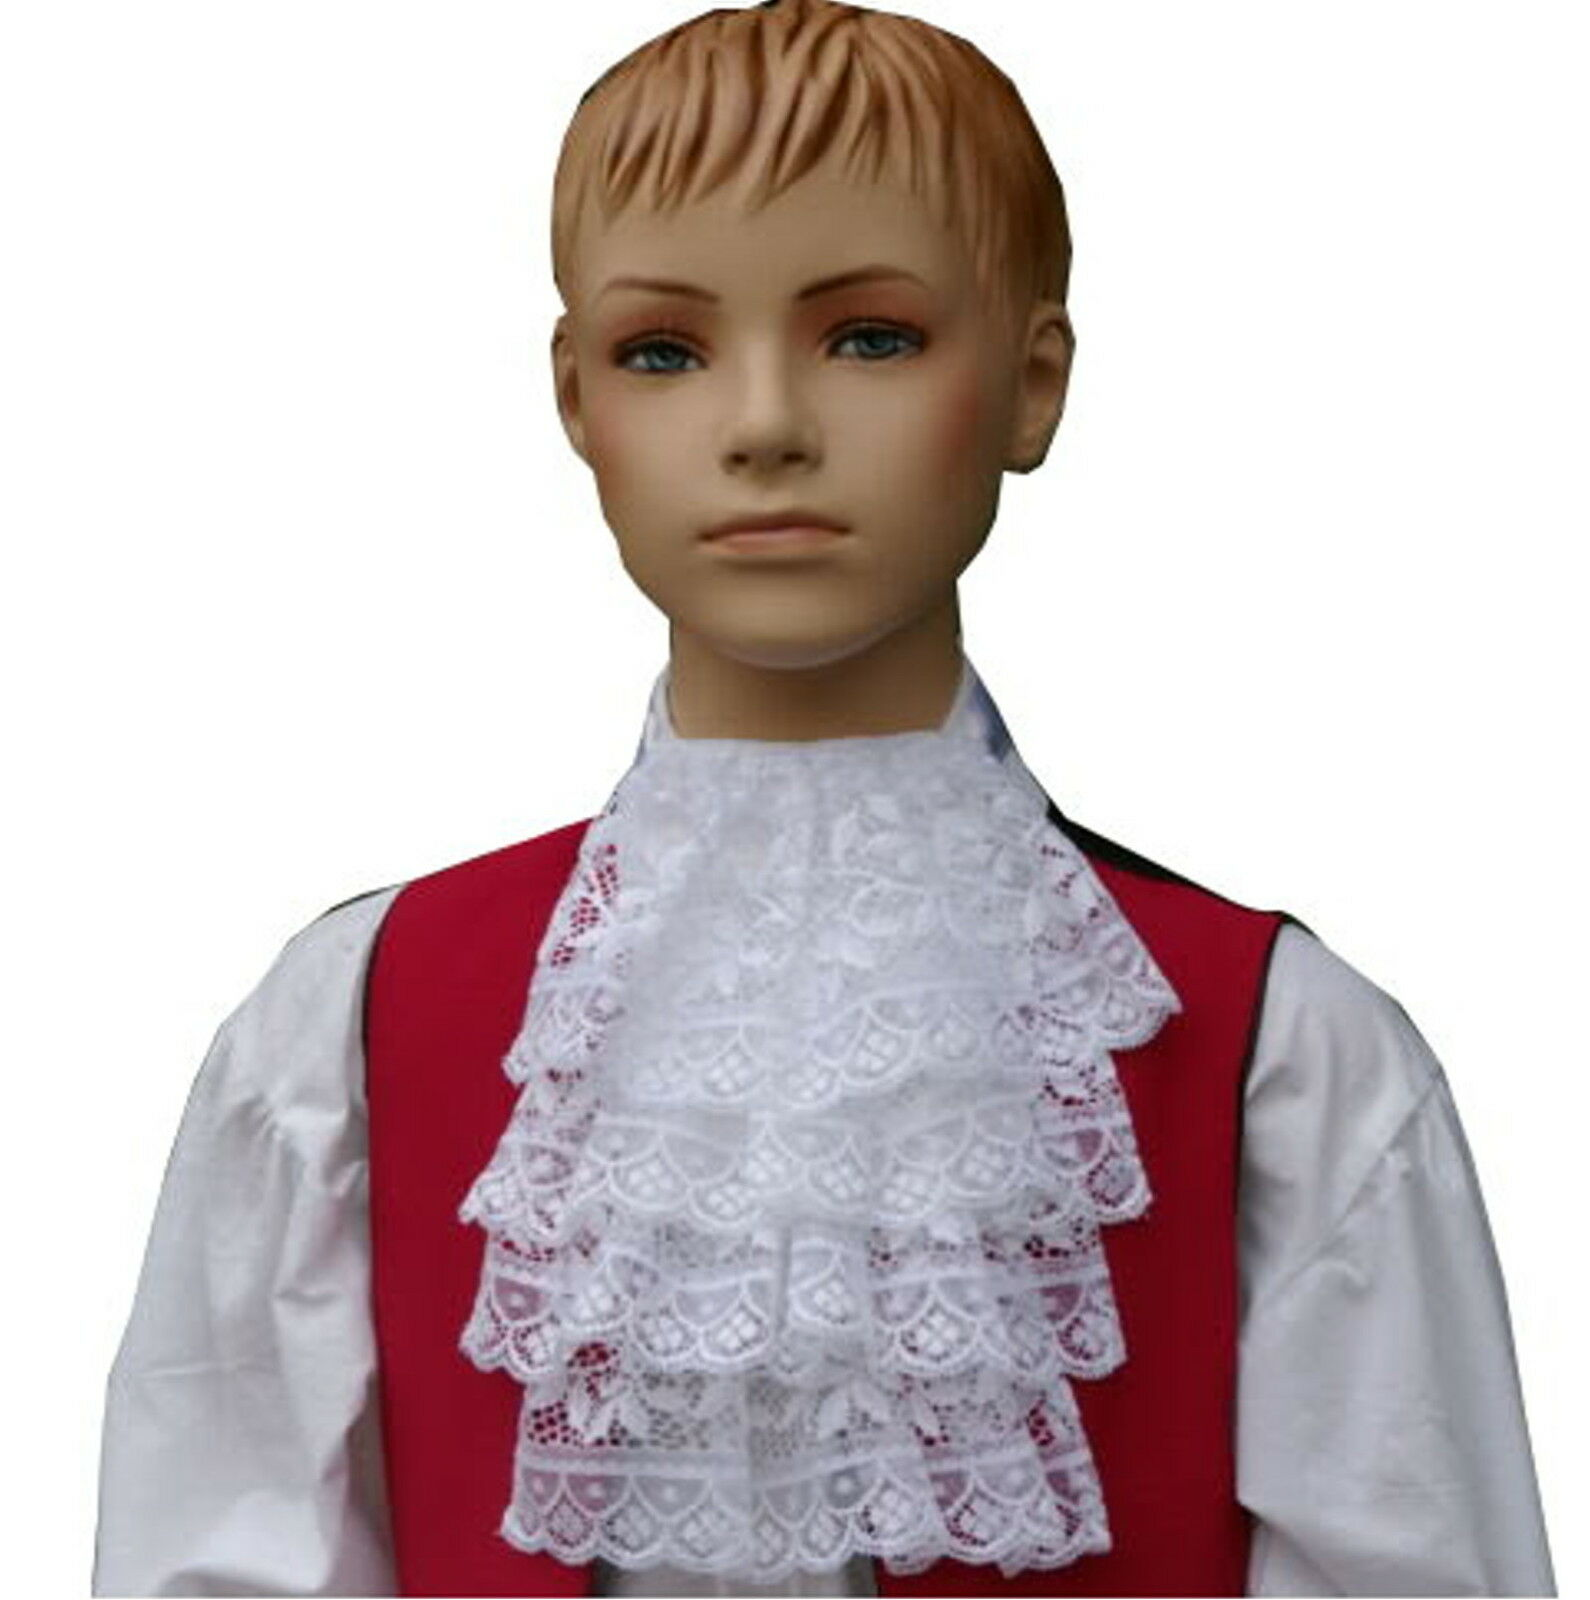 Boys Victorian / Georgian lace jabot cravat sizes 2-6 yrs 6-10 yrs or 10-14 yrs